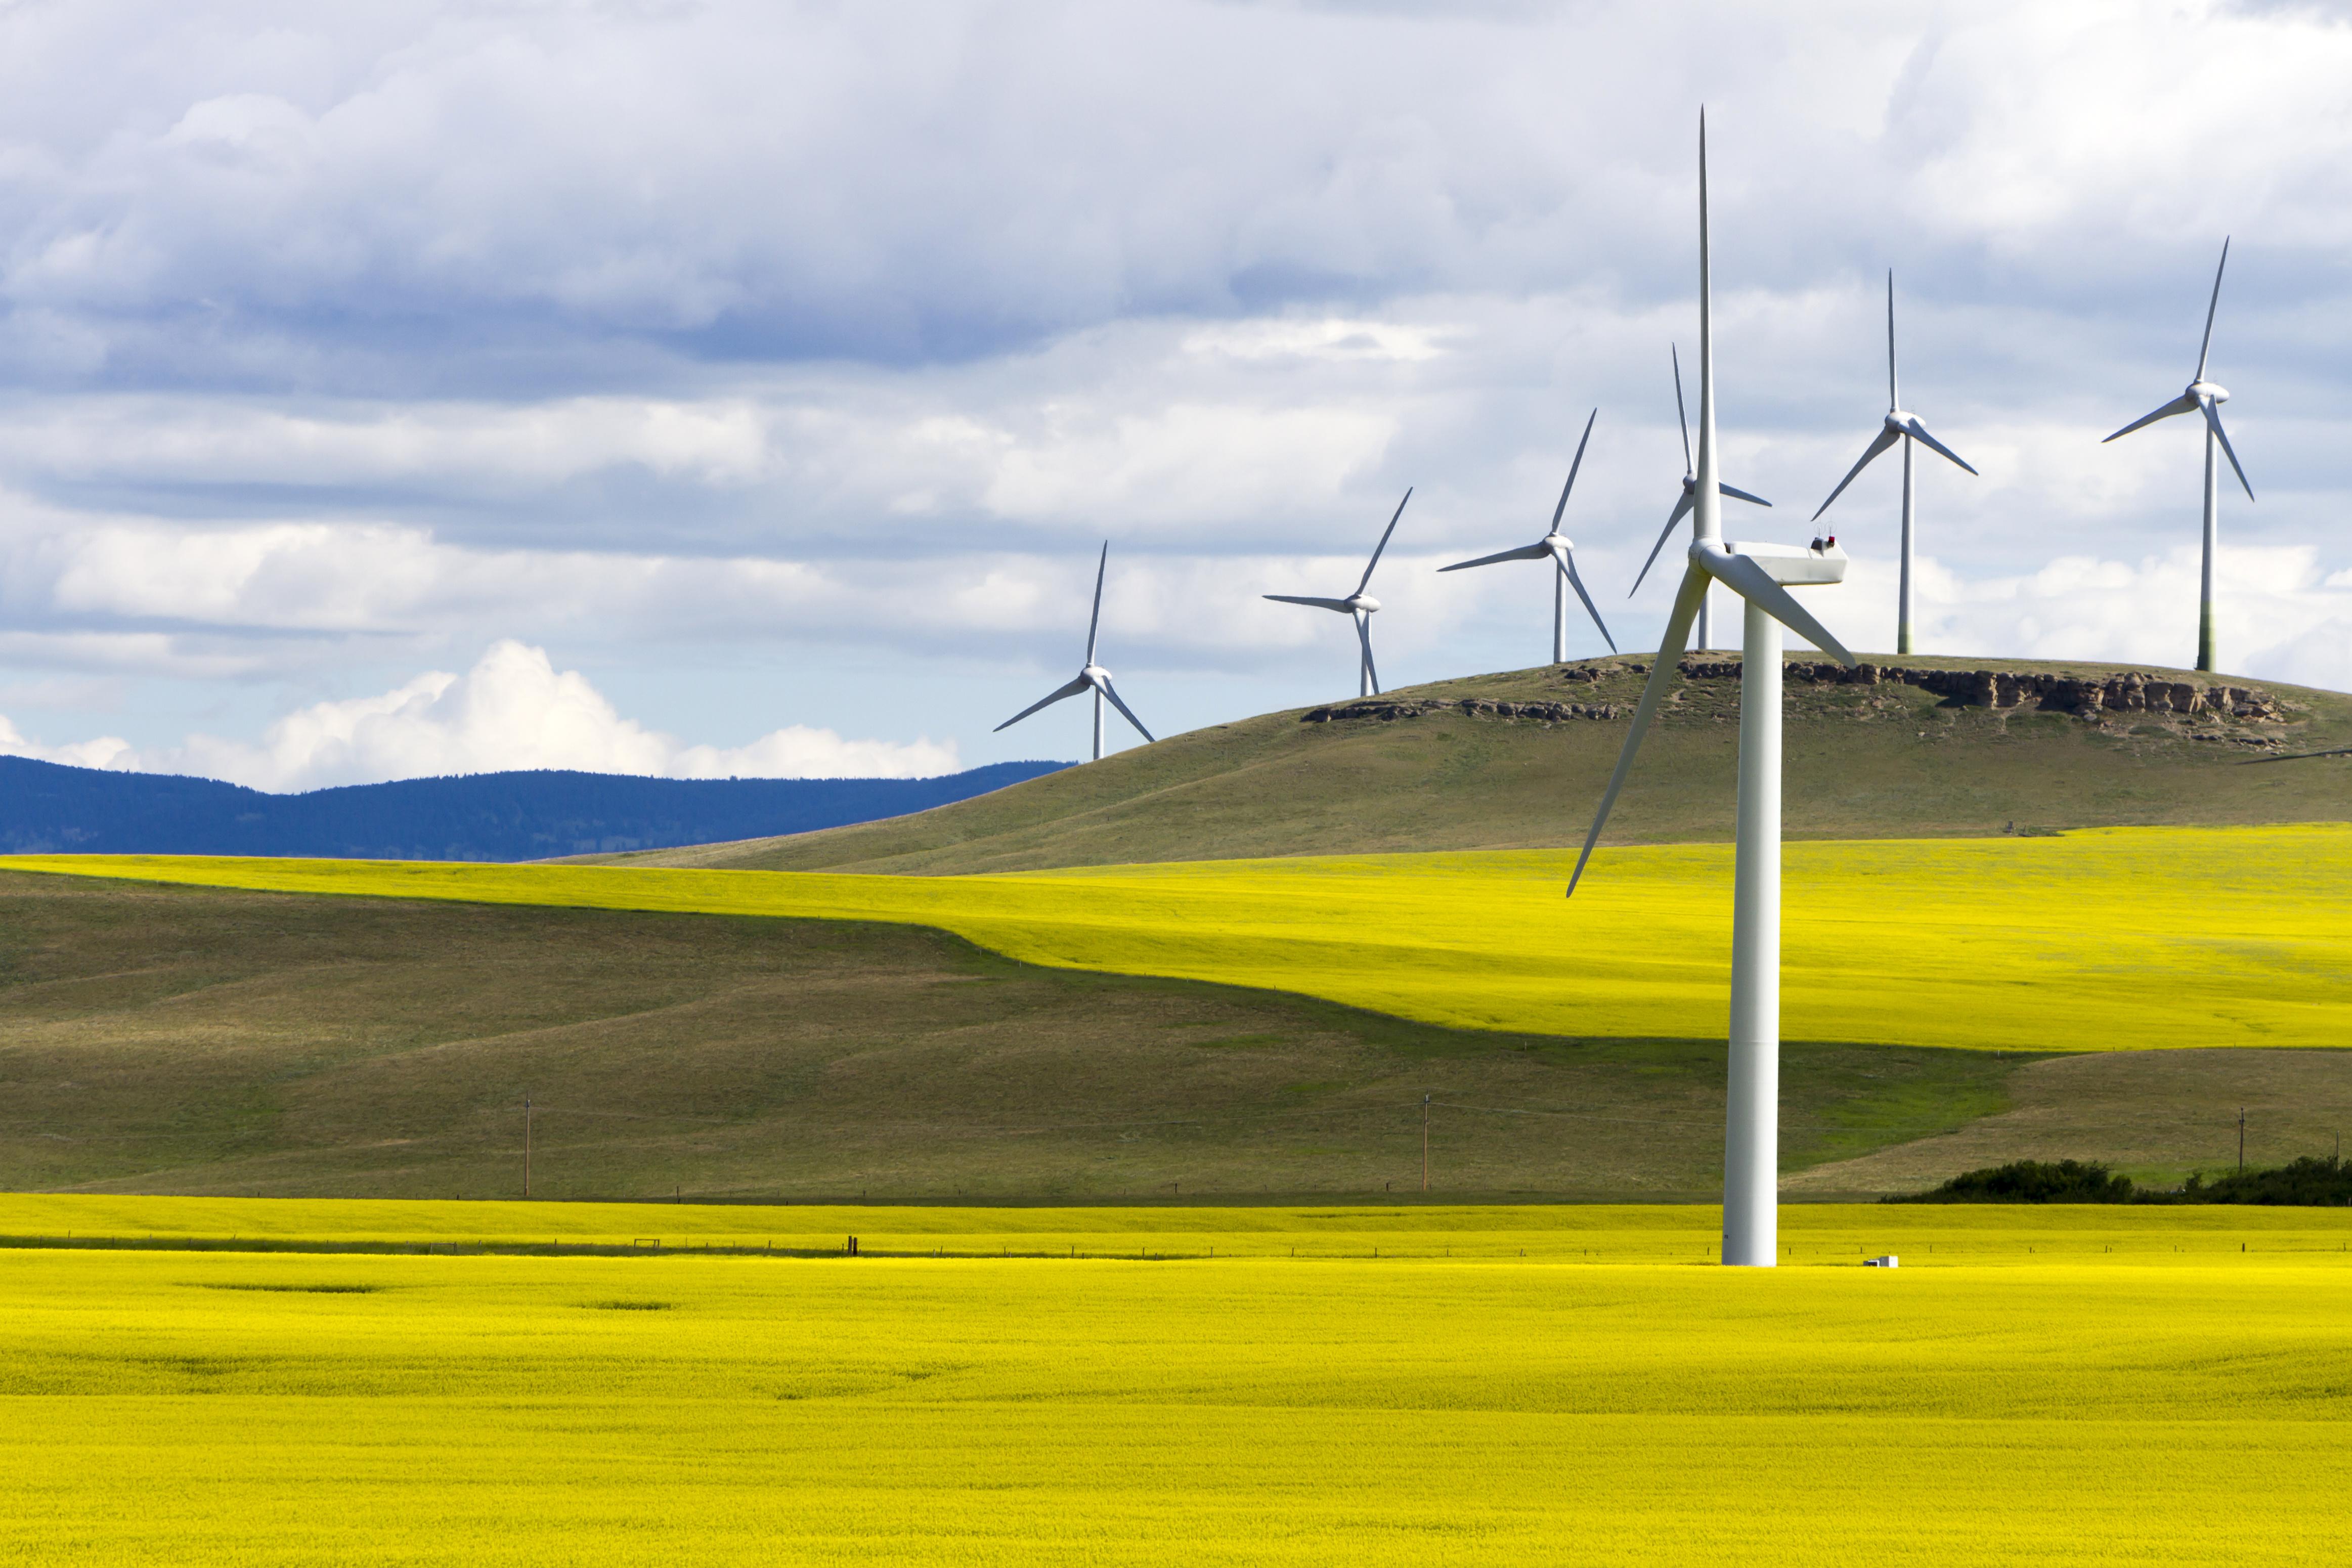 Wind turbine renewable energy, Western Canada